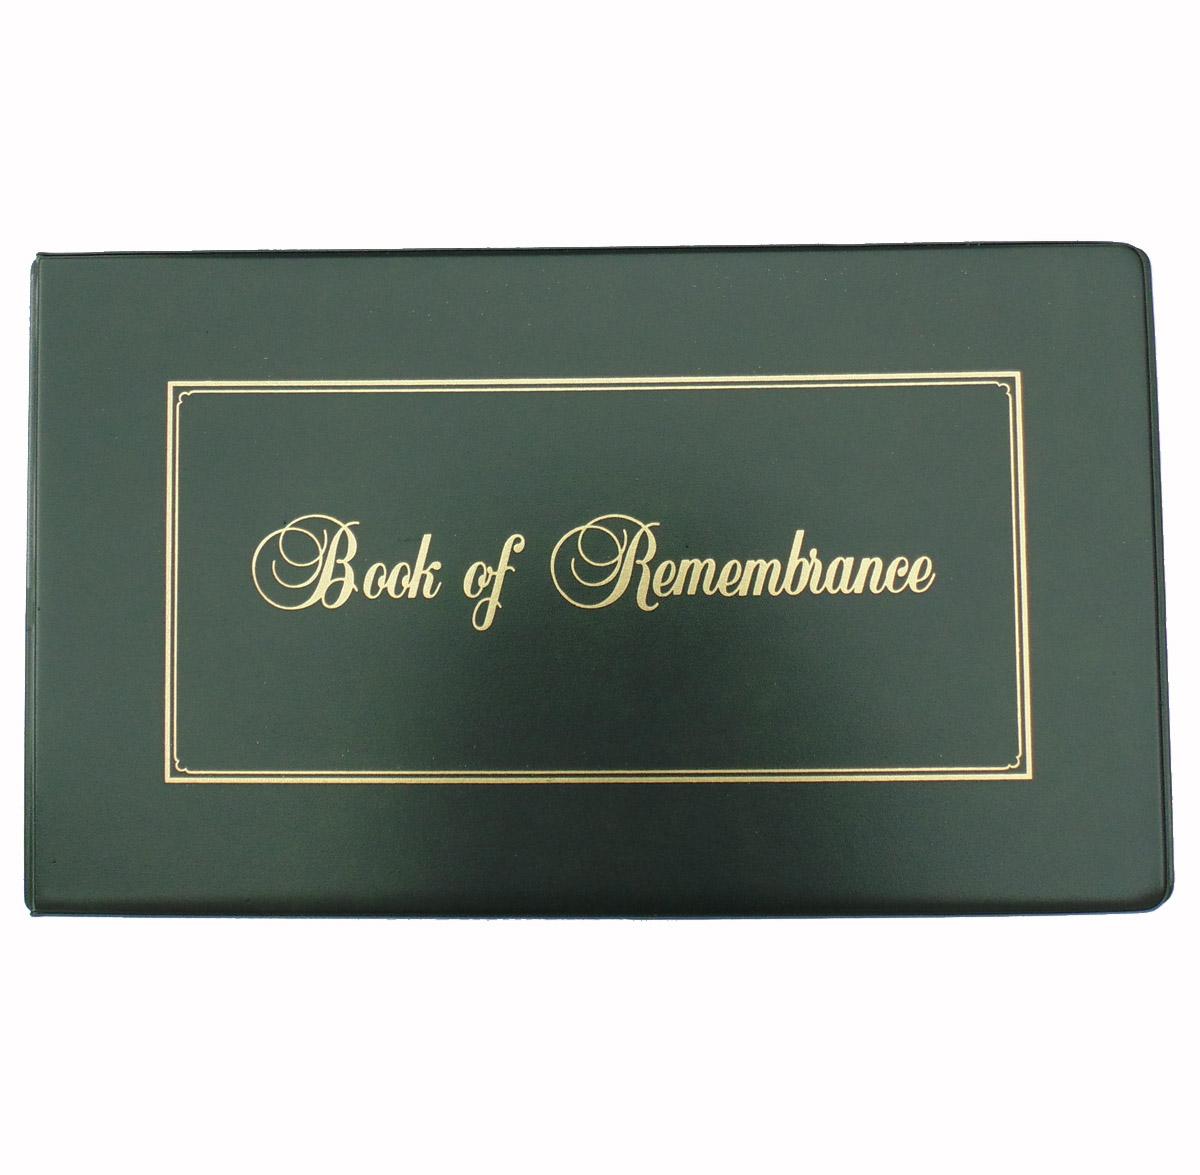 Legal D Ring Book Of Remembrance Binder Stevenson